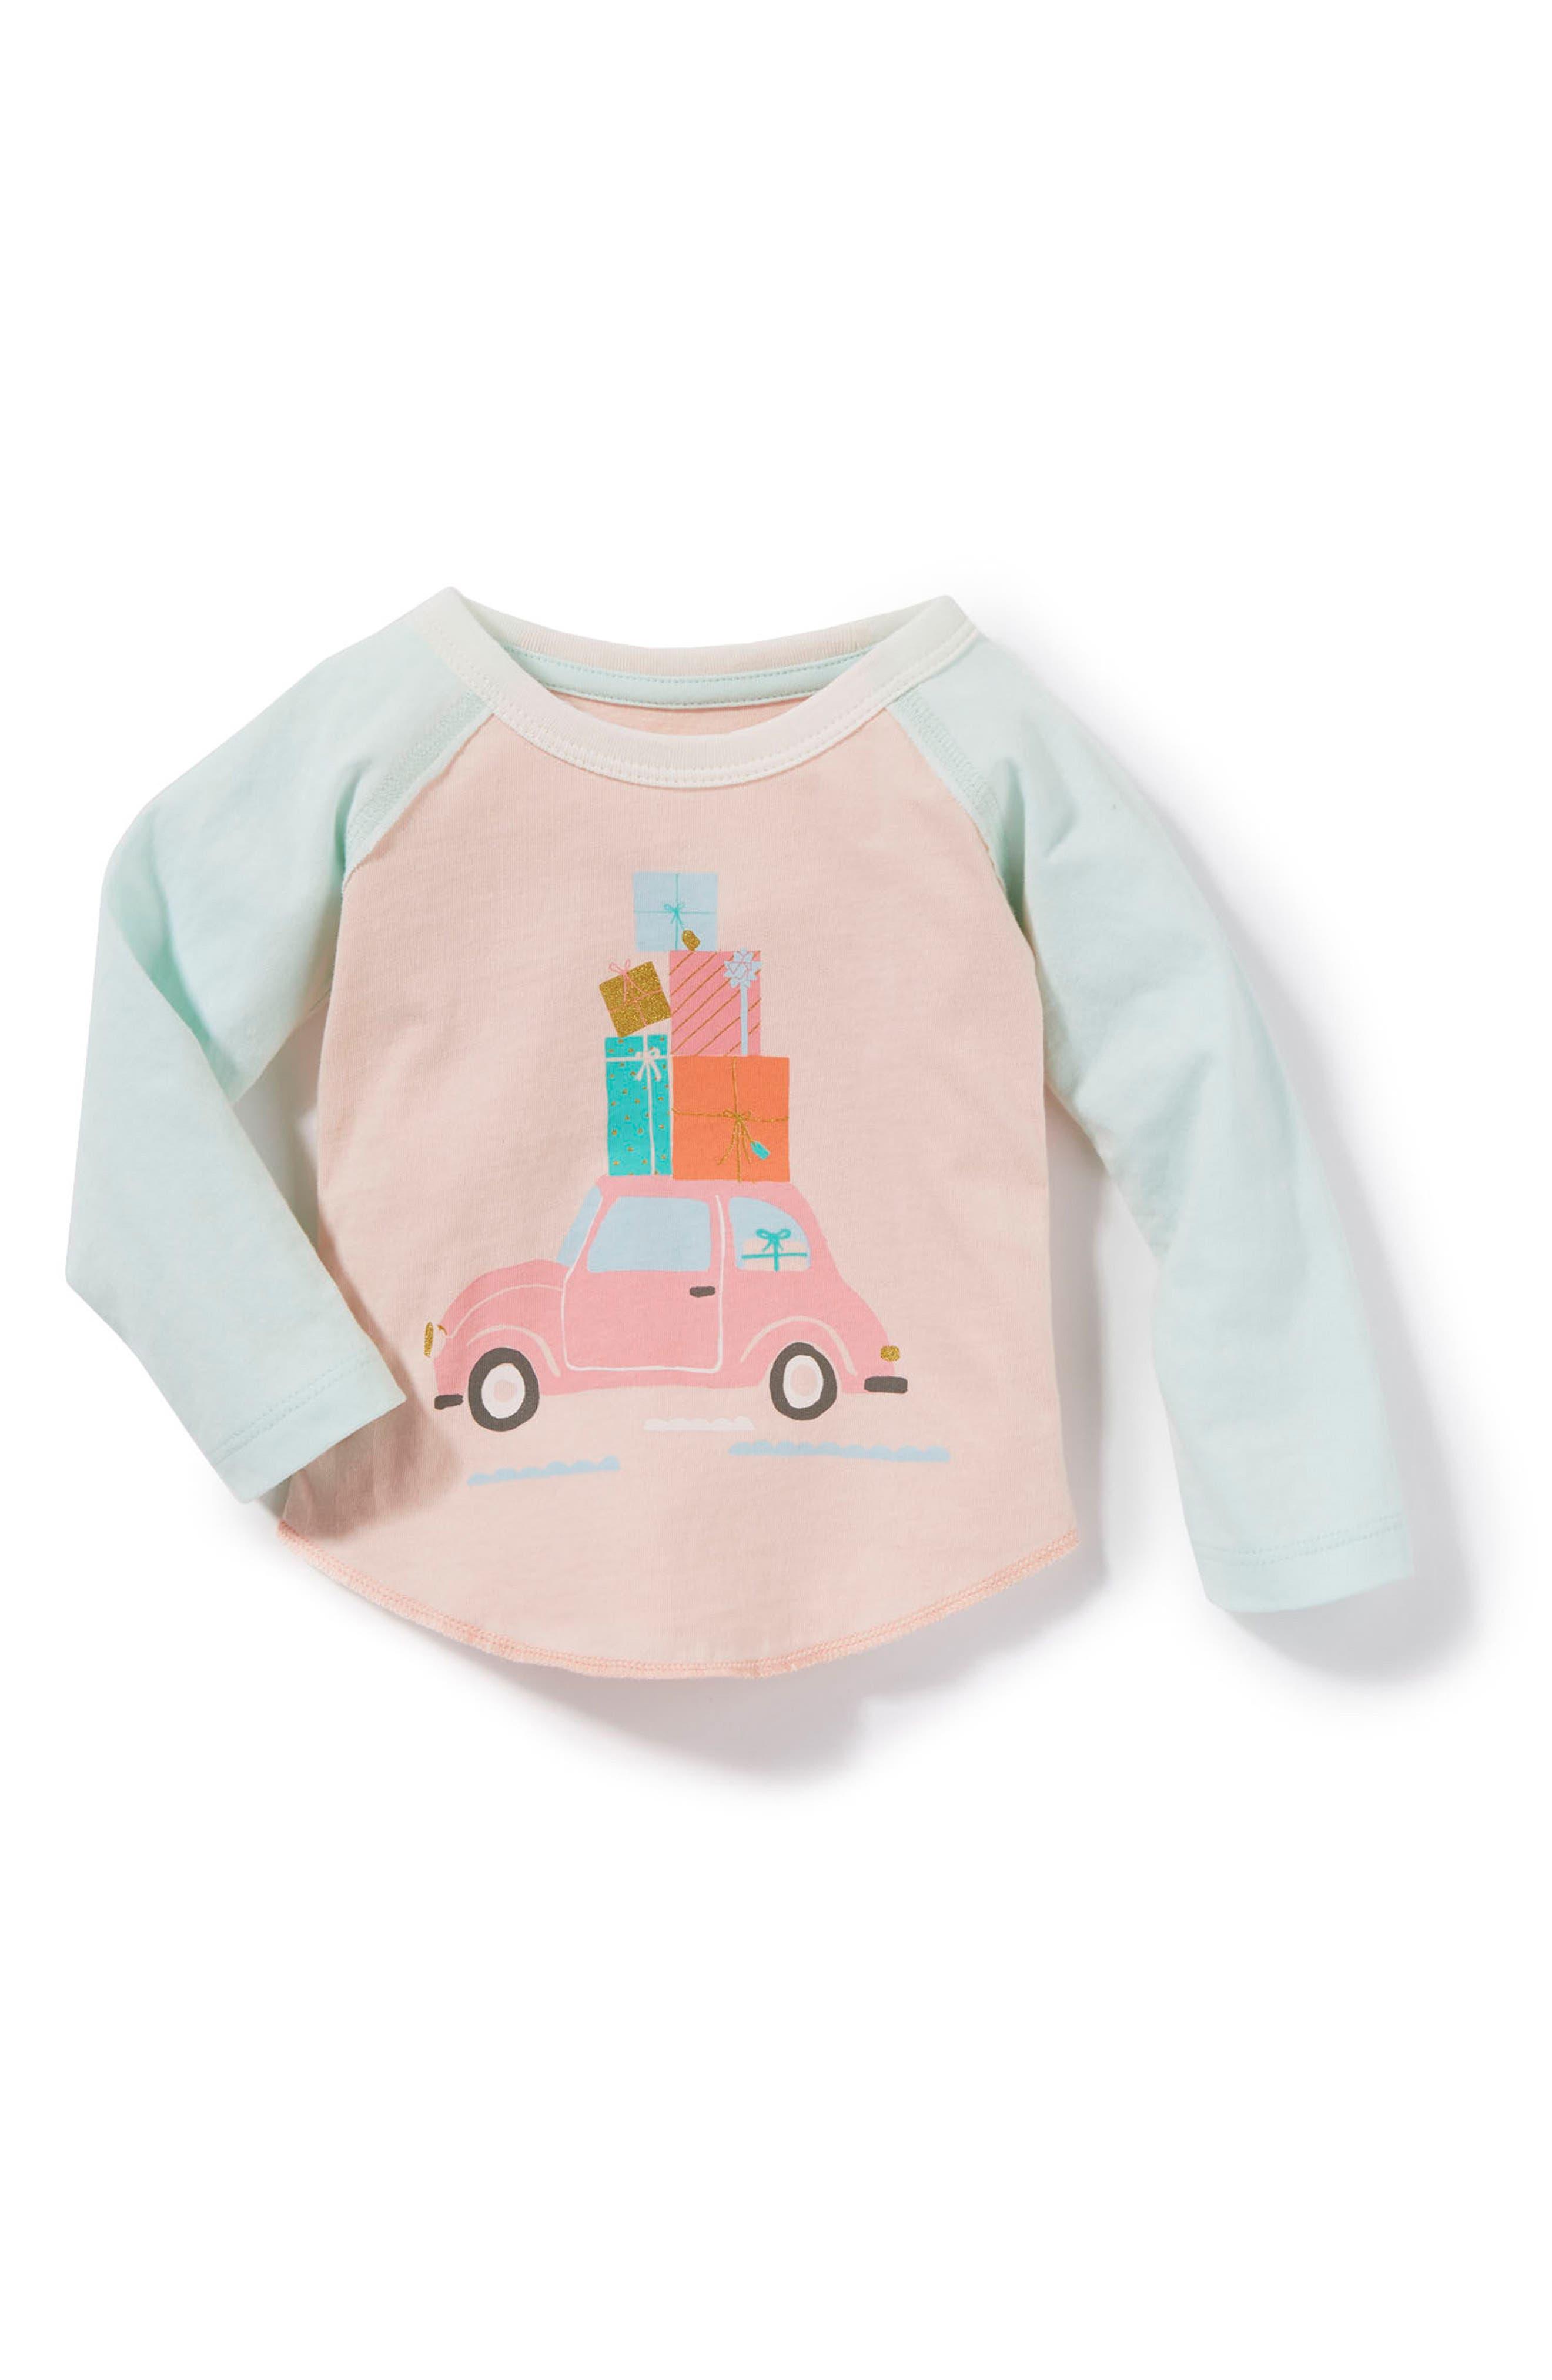 Main Image - Peek Car & Presents Graphic Tee (Baby Girls)